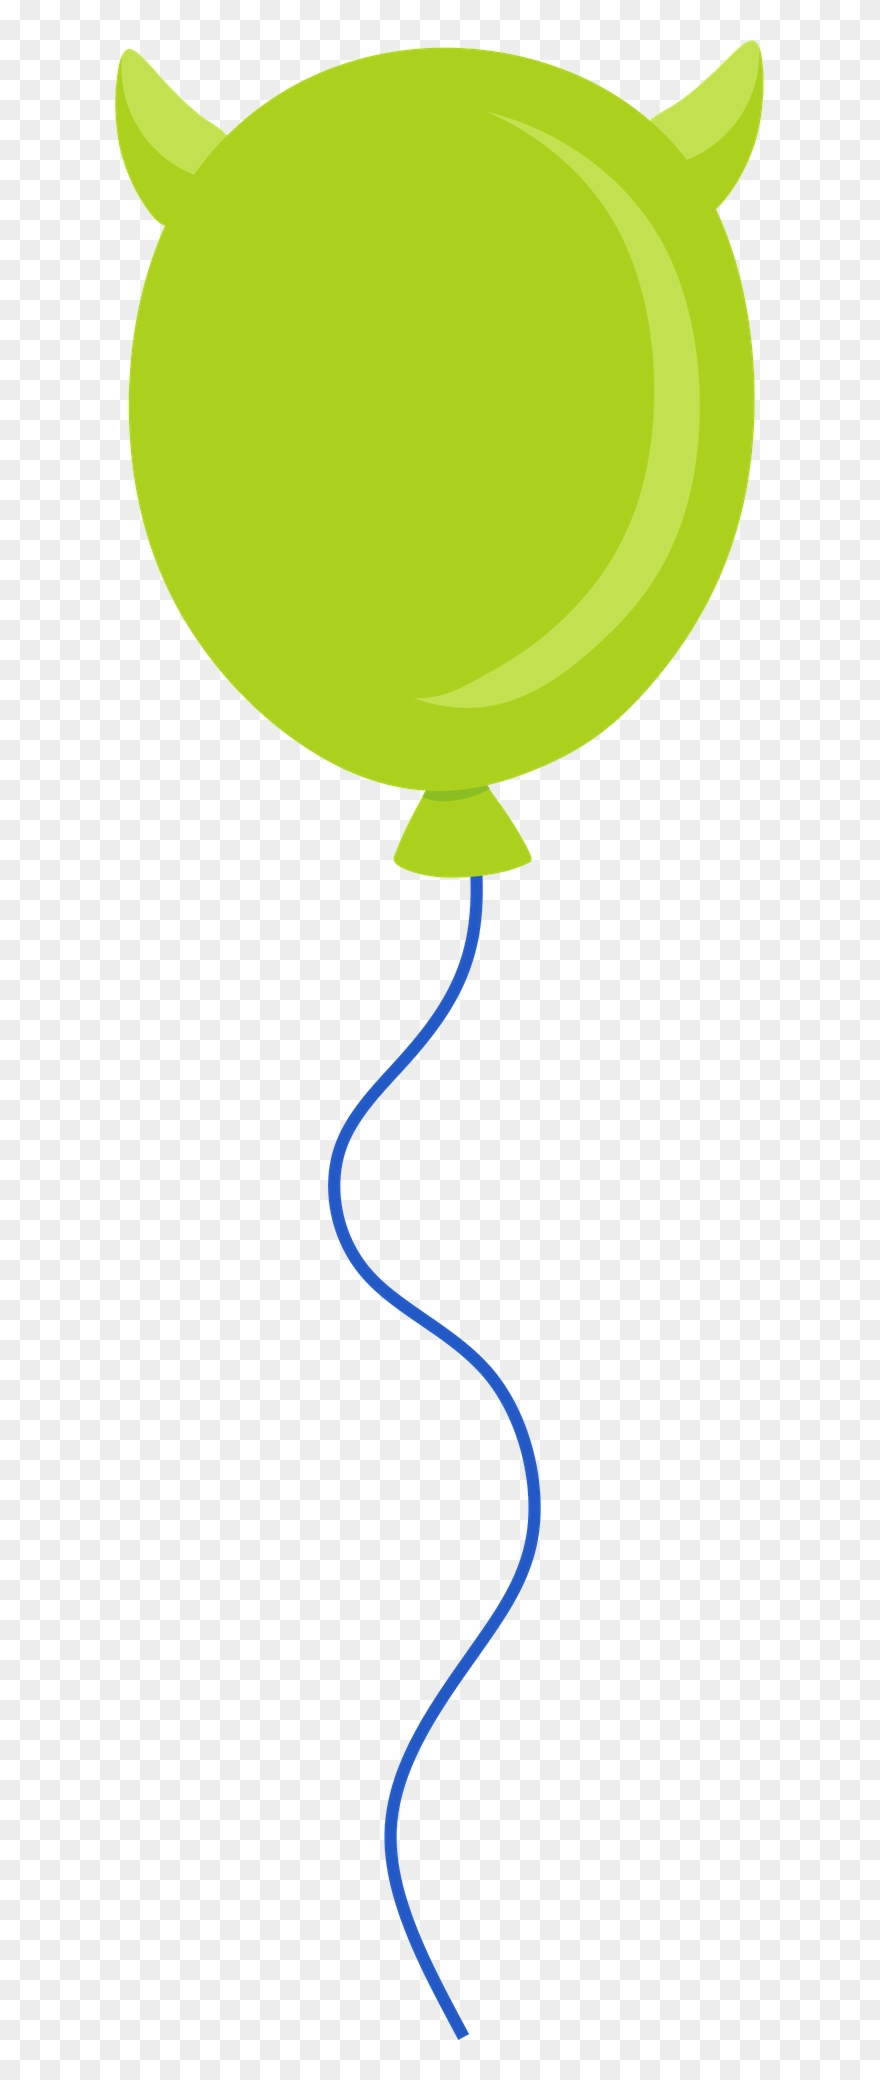 Monster S Monster Party Monster University Vaza Monster Inc Balloons Clipart Png Download 658822 Pinclipart